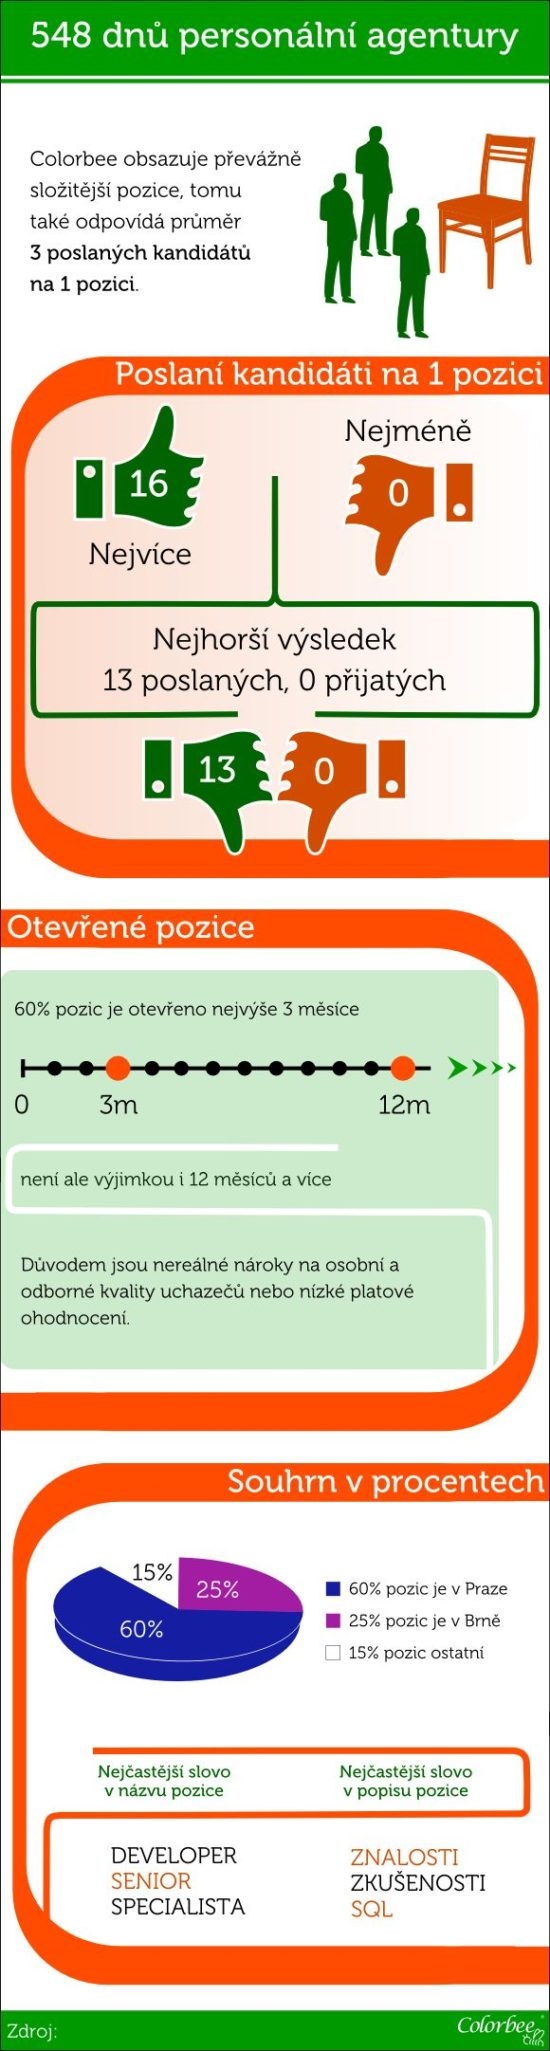 548 dnu personalni agentury - infografika